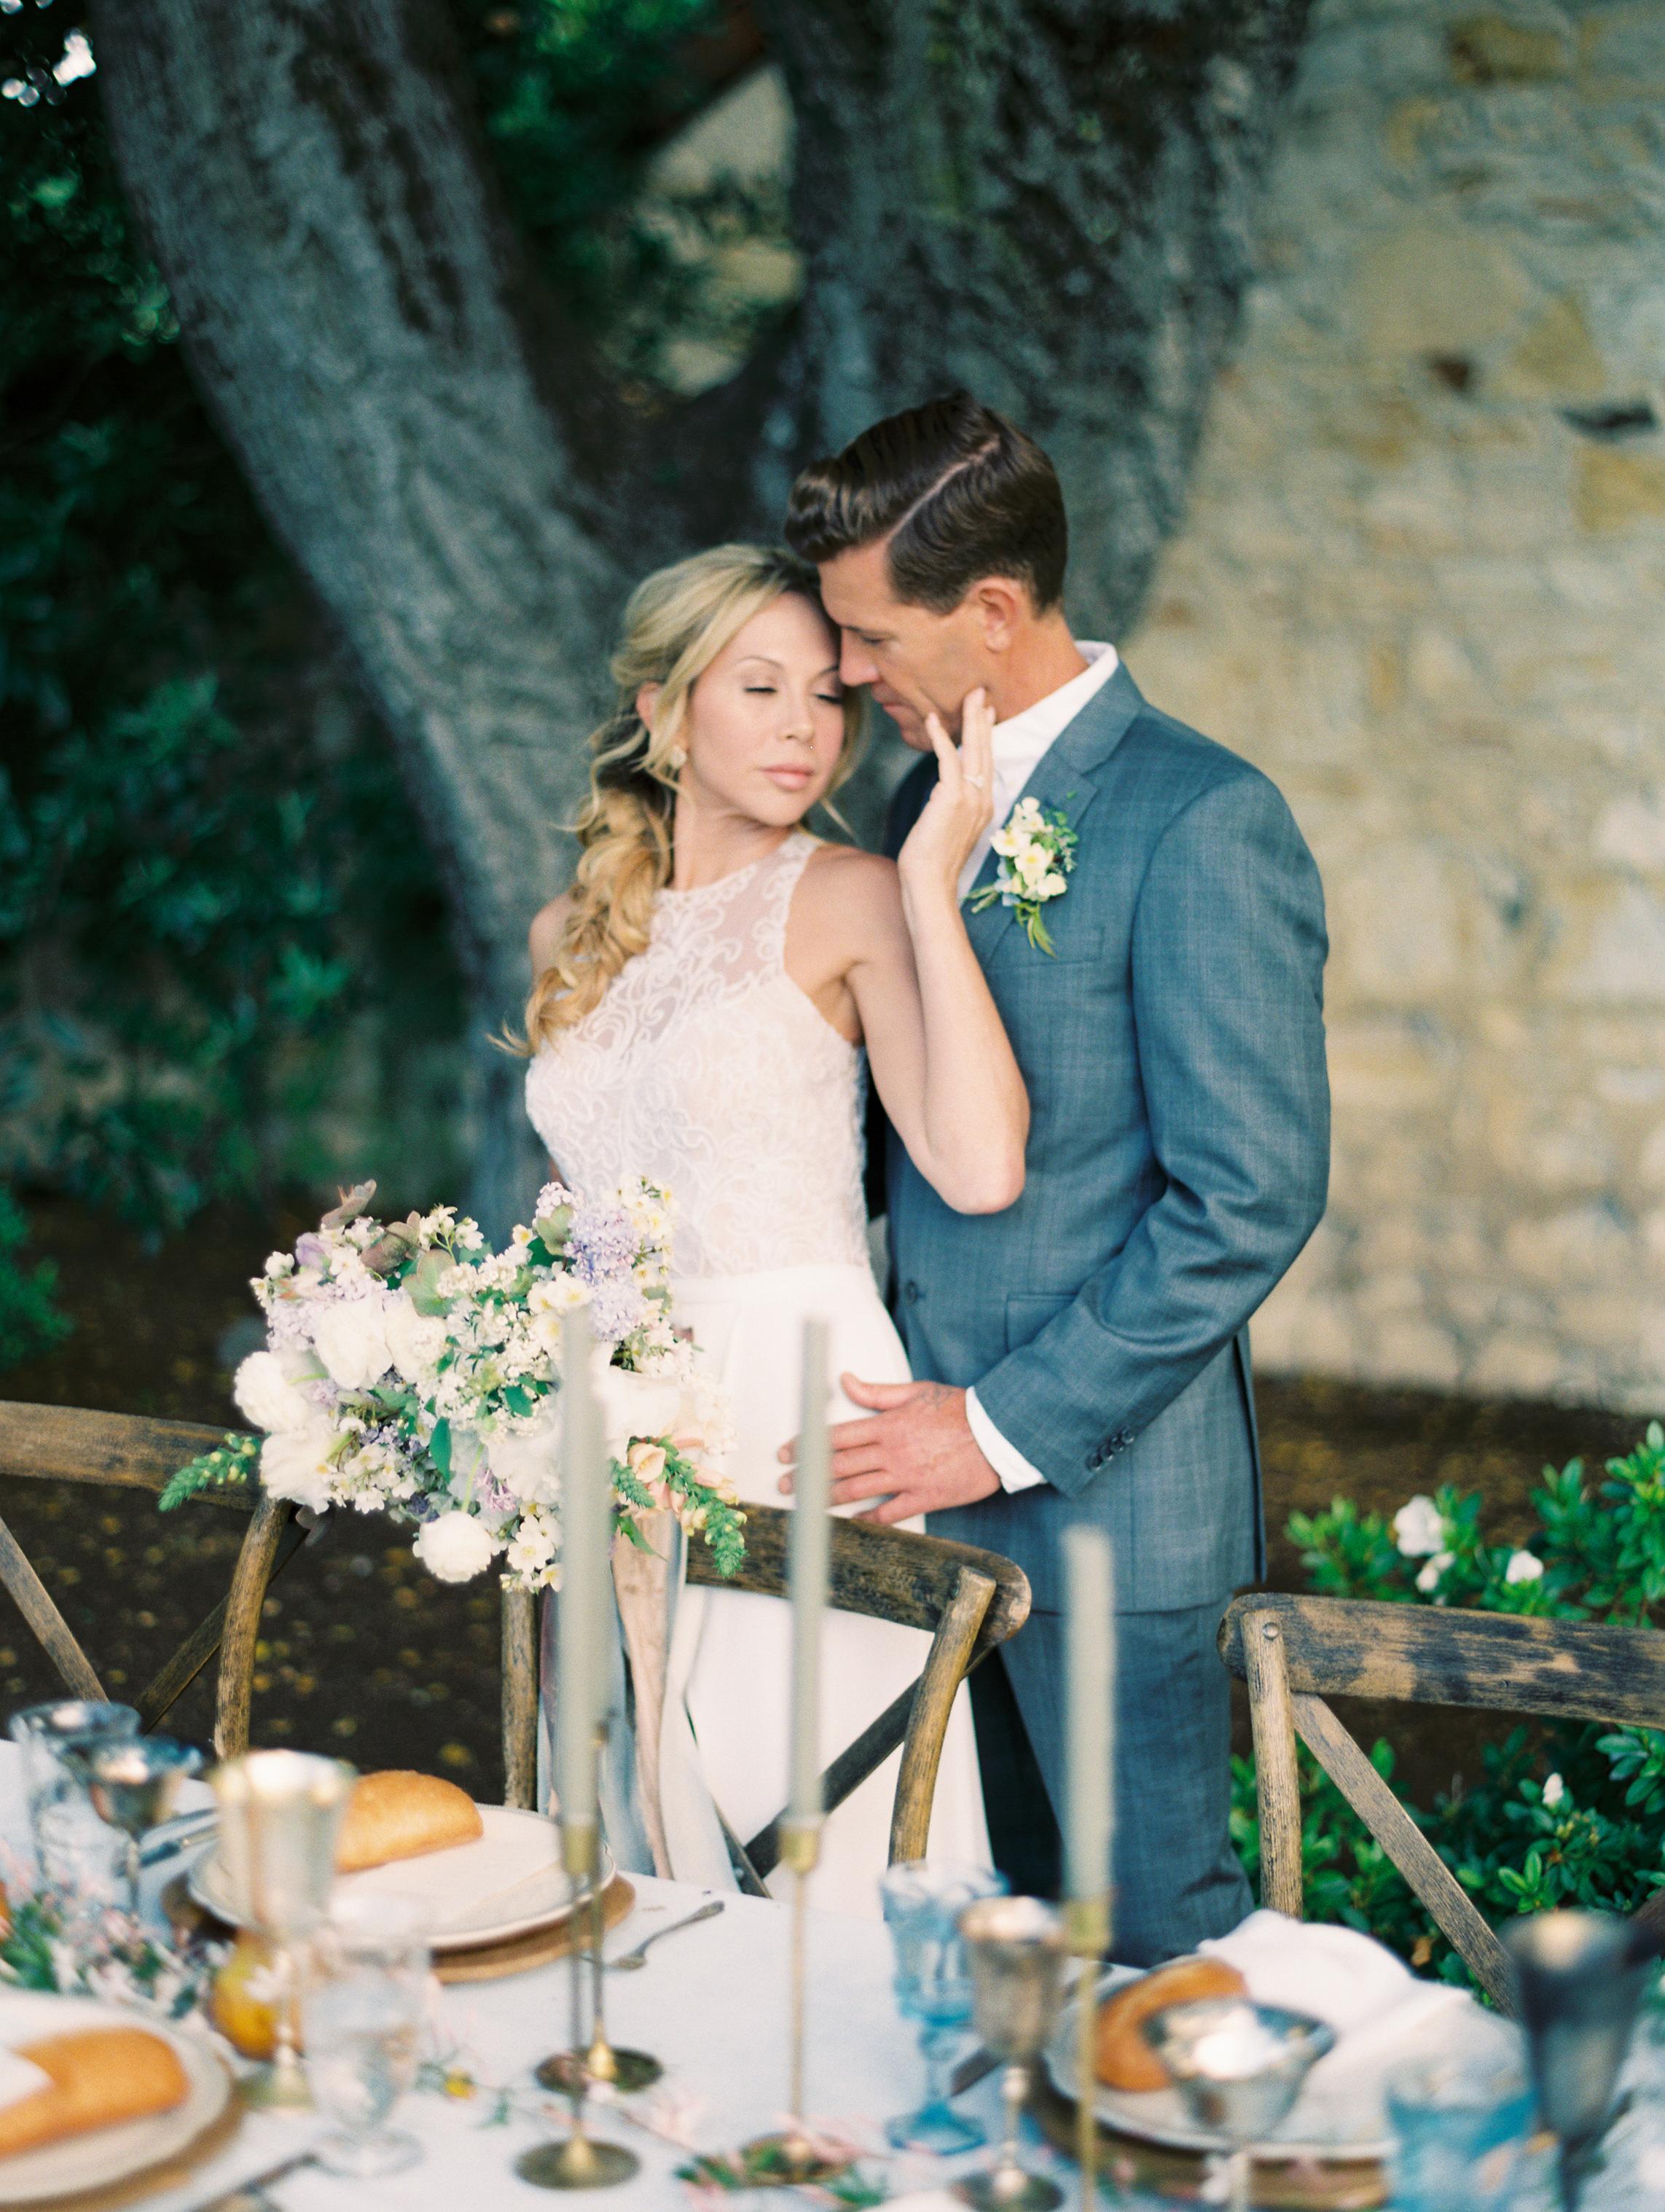 holman+ranch+wedding+bloom+workshop-31.jpg